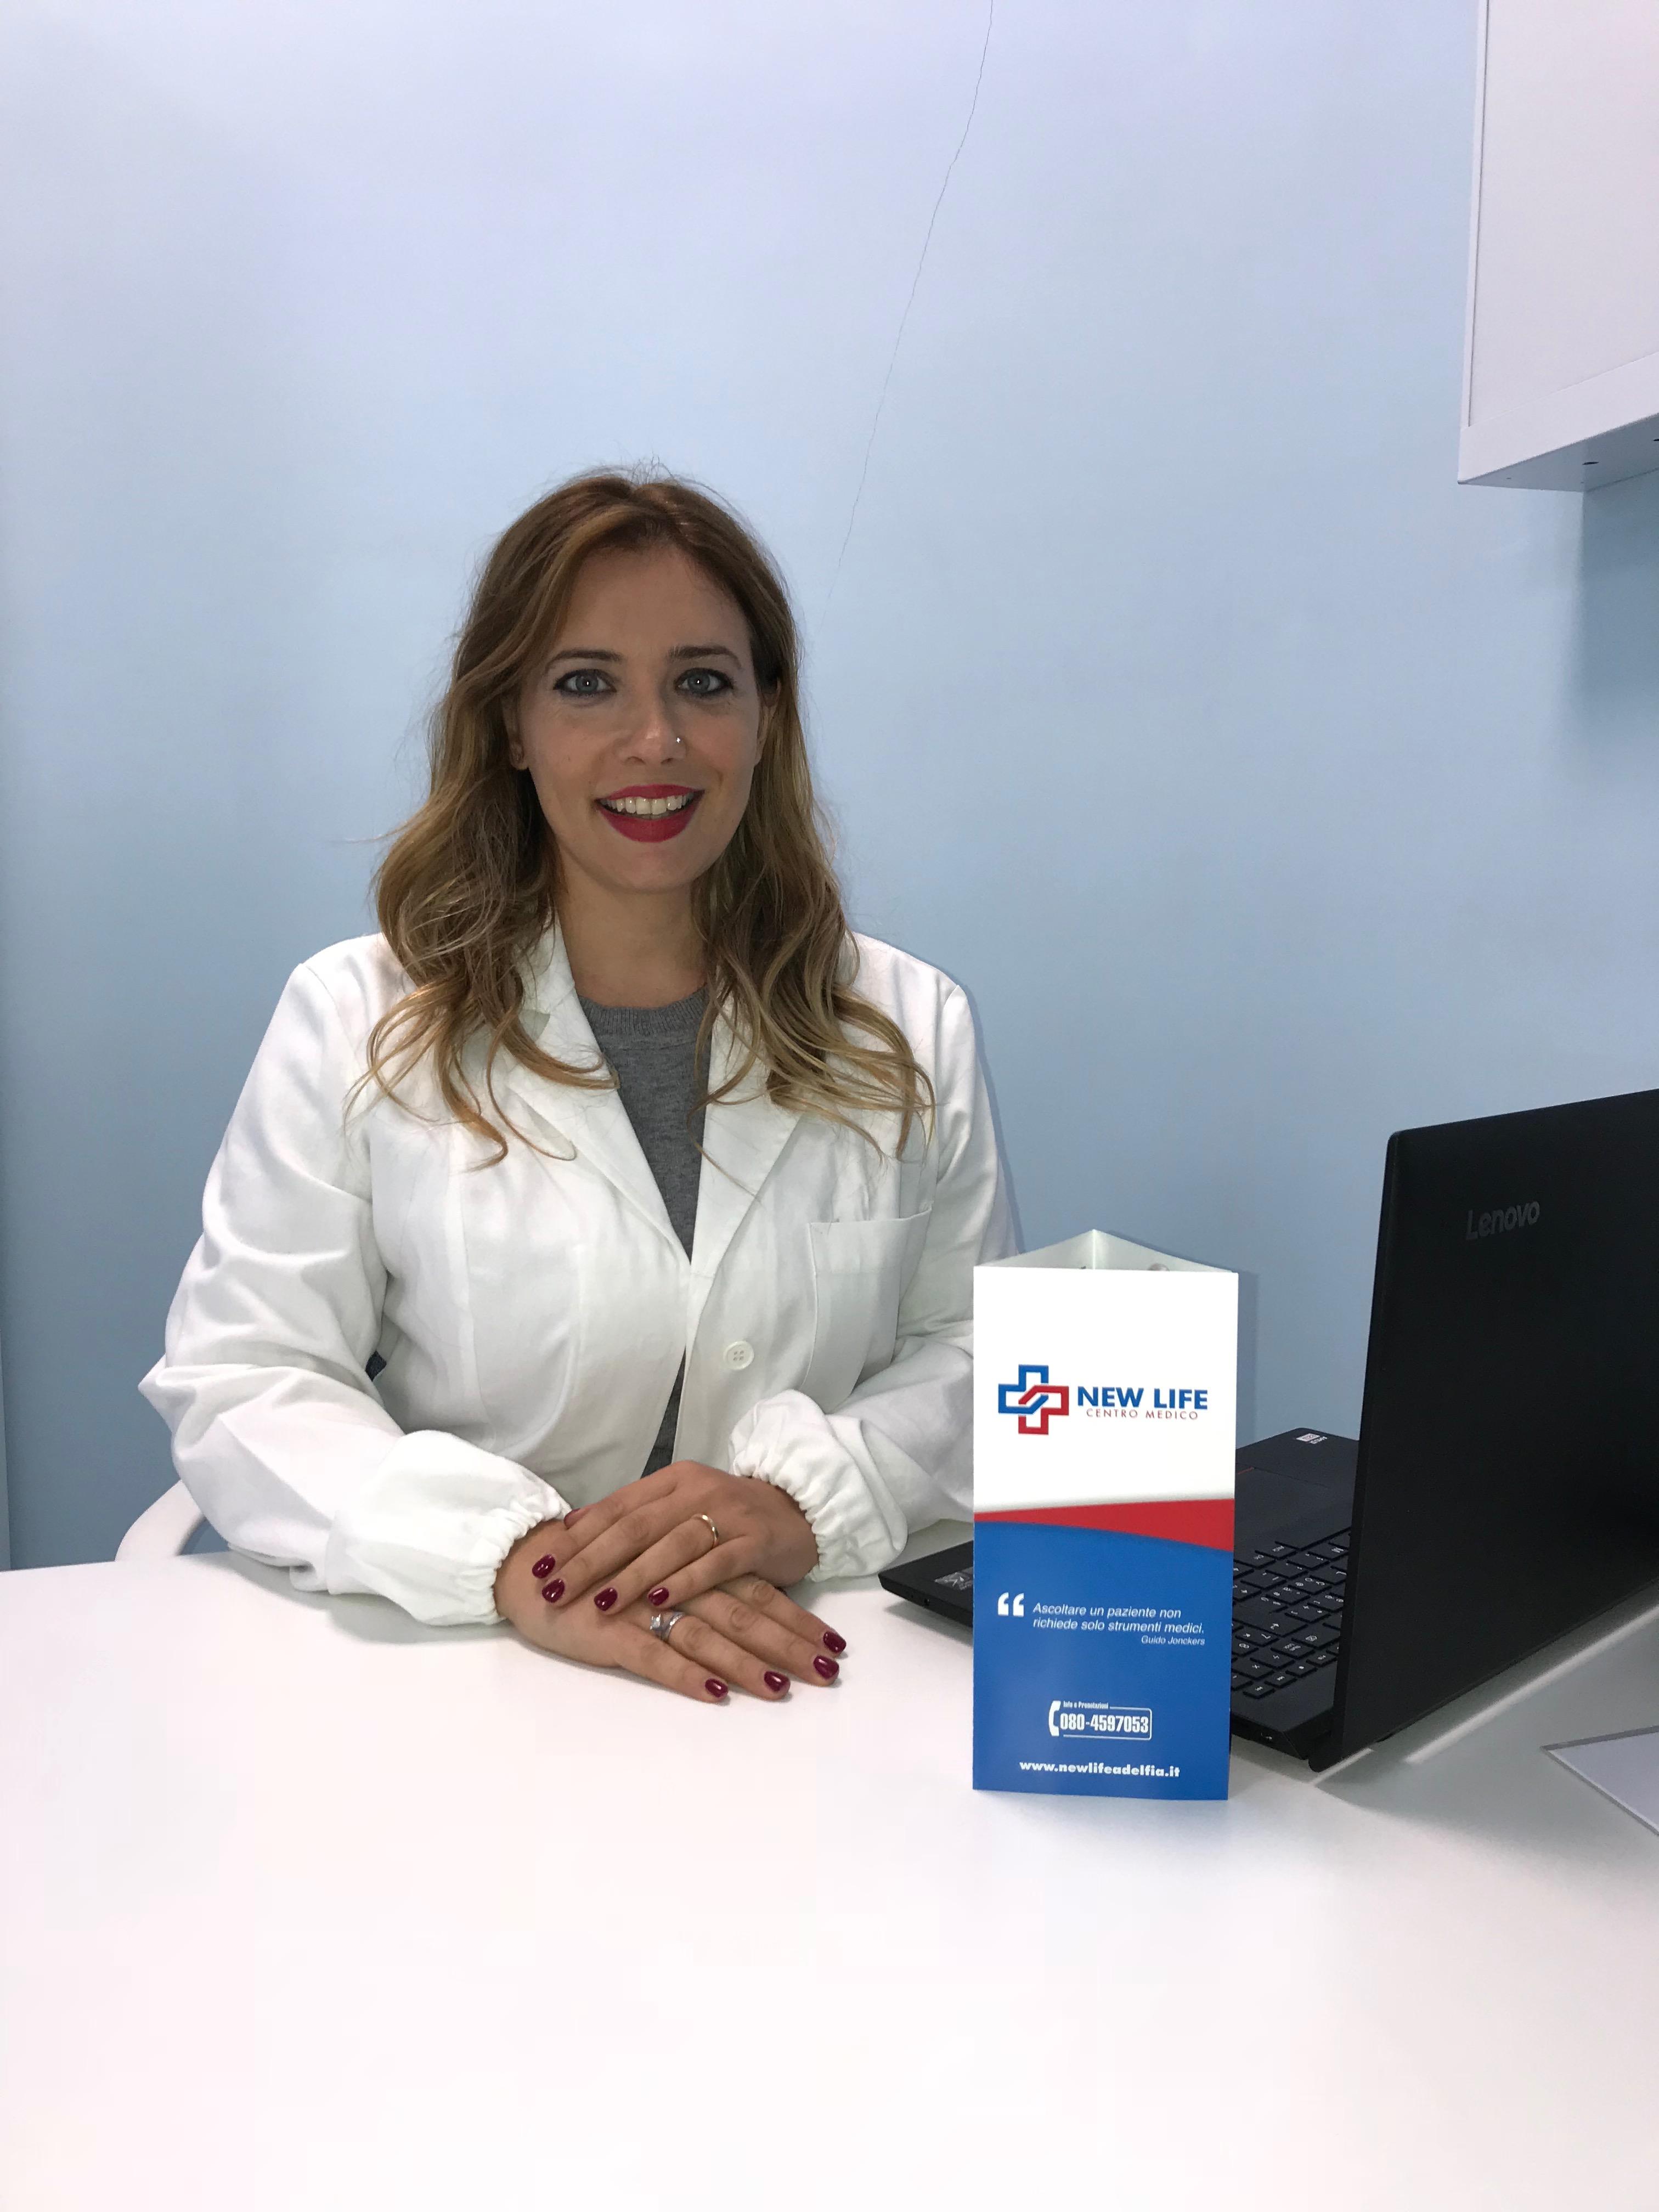 Dott. SETTE Gabriella